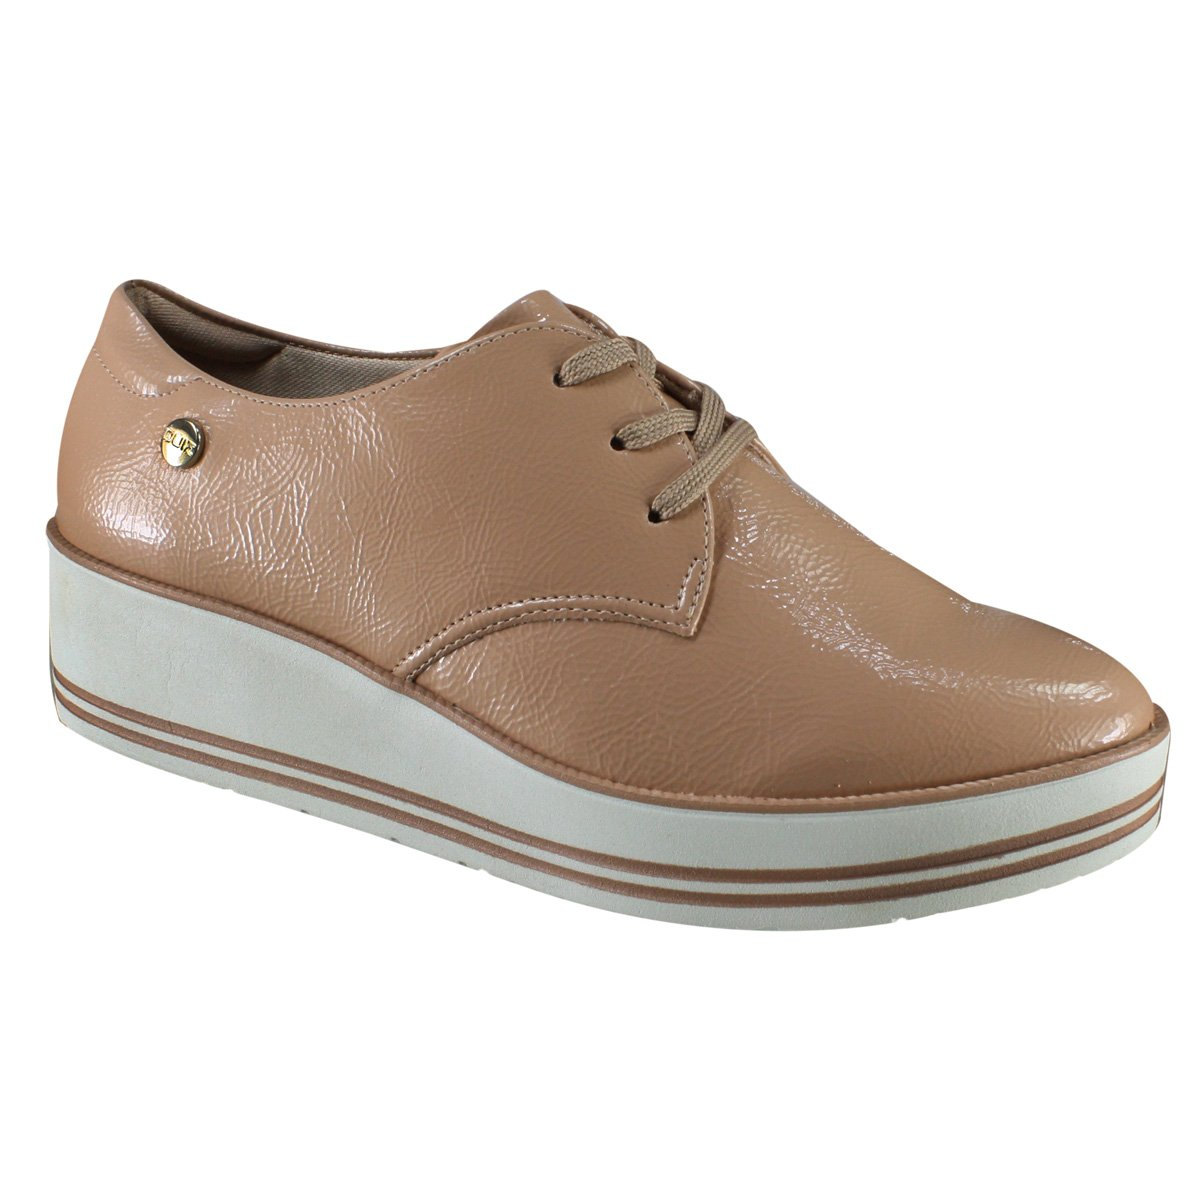 98874ee377 Sapato Feminino Quiz Oxford 68-58216 - Antique (Verniz Show ...